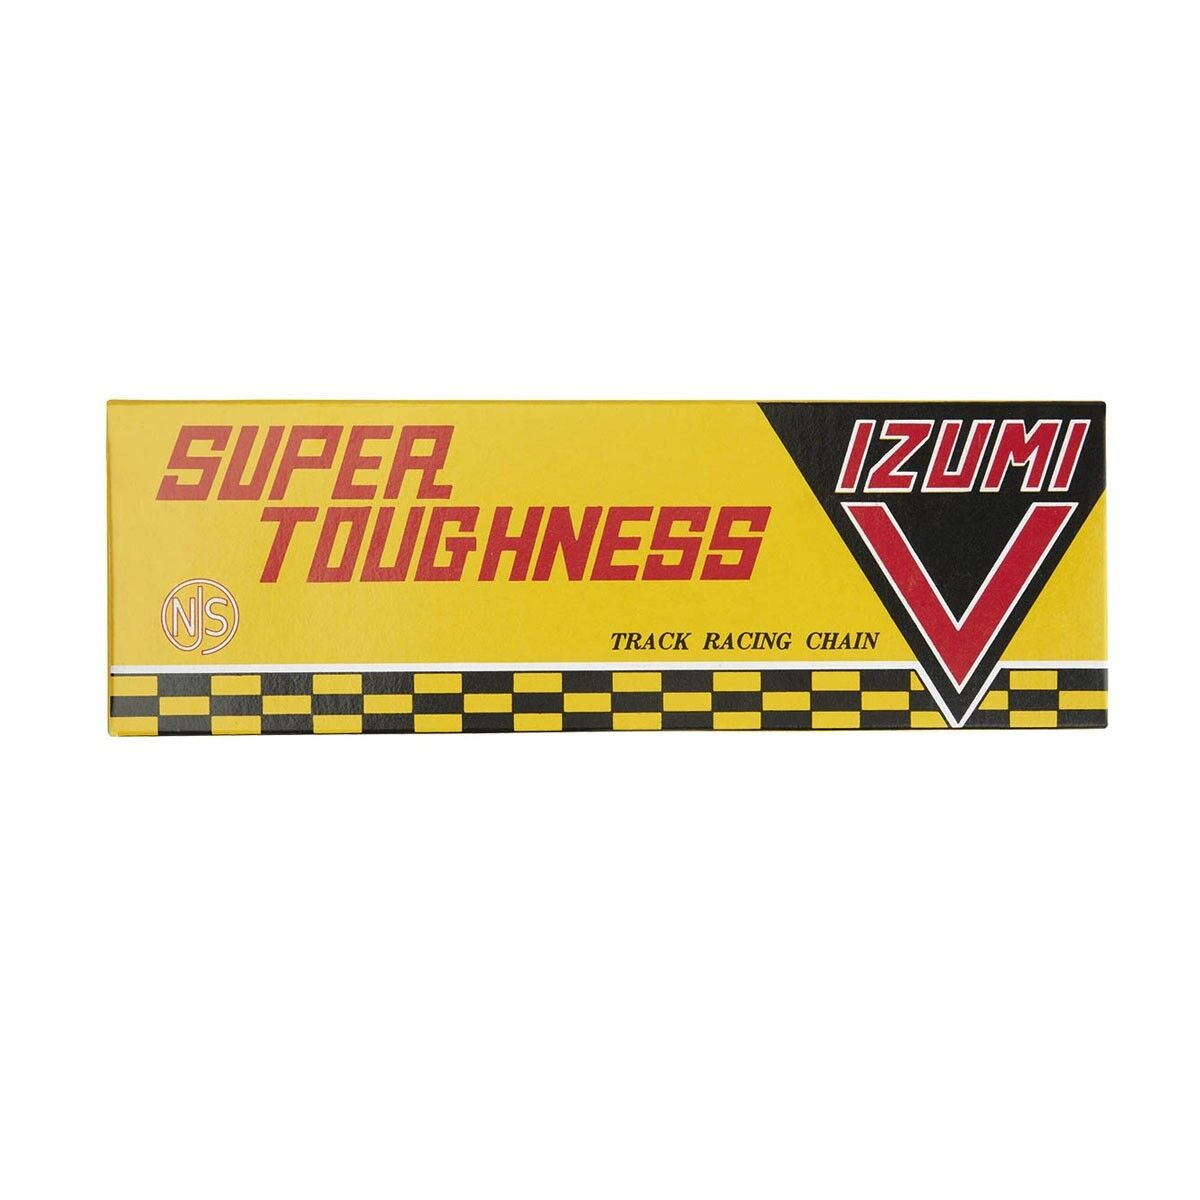 Izumi Super Toughness V chain Gold schwarz - 1 2 x  1 8 106 links - single speed